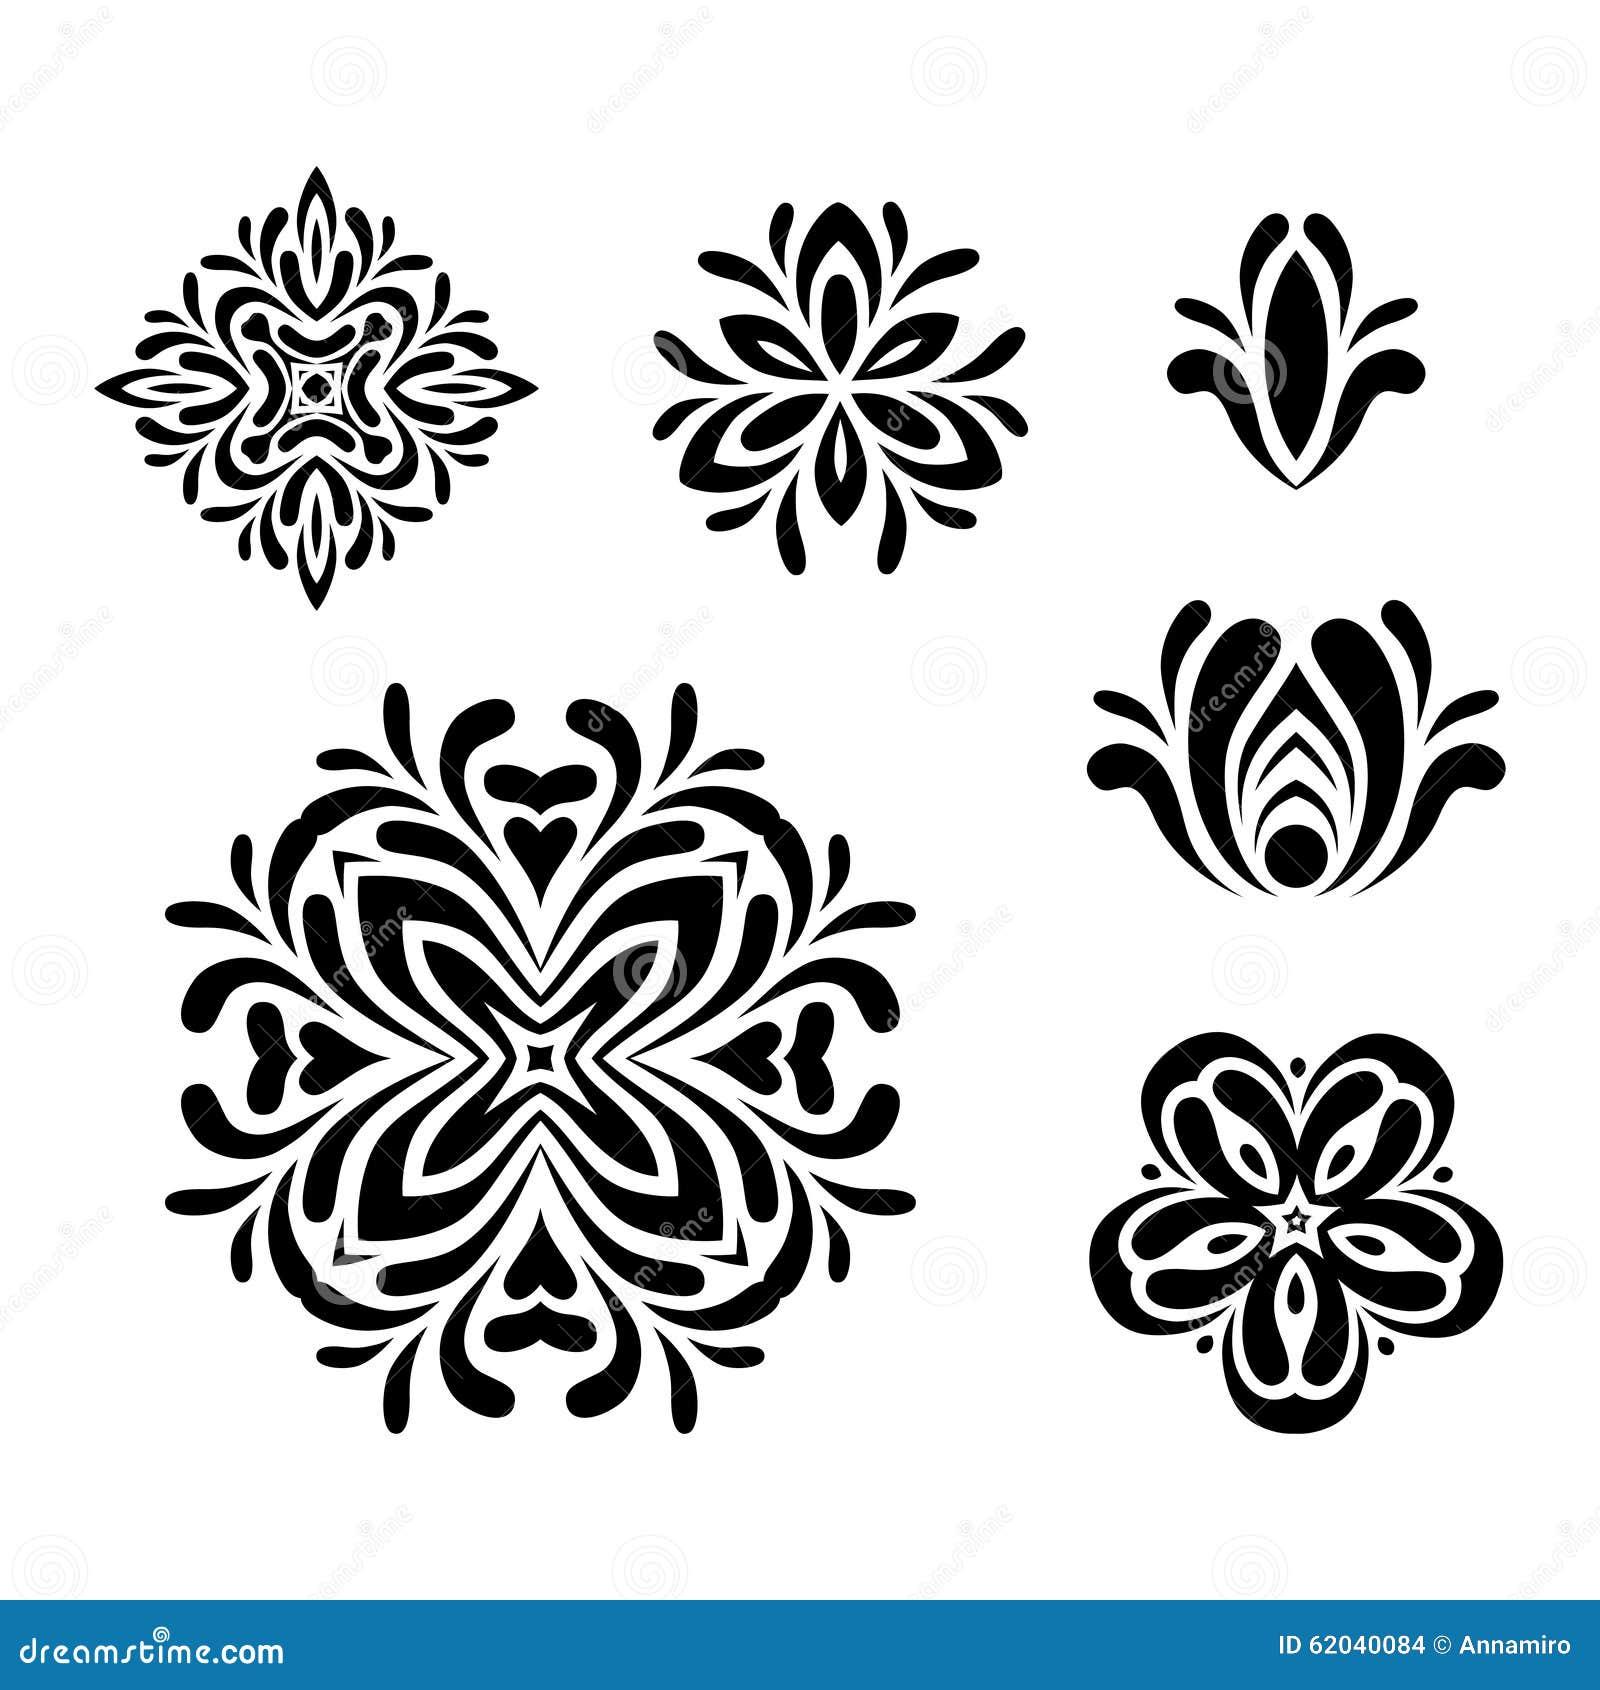 Set Of Black Flower Design Elements Vector Illustration: Set Of Graphic Floral Design Elements. Stock Vector